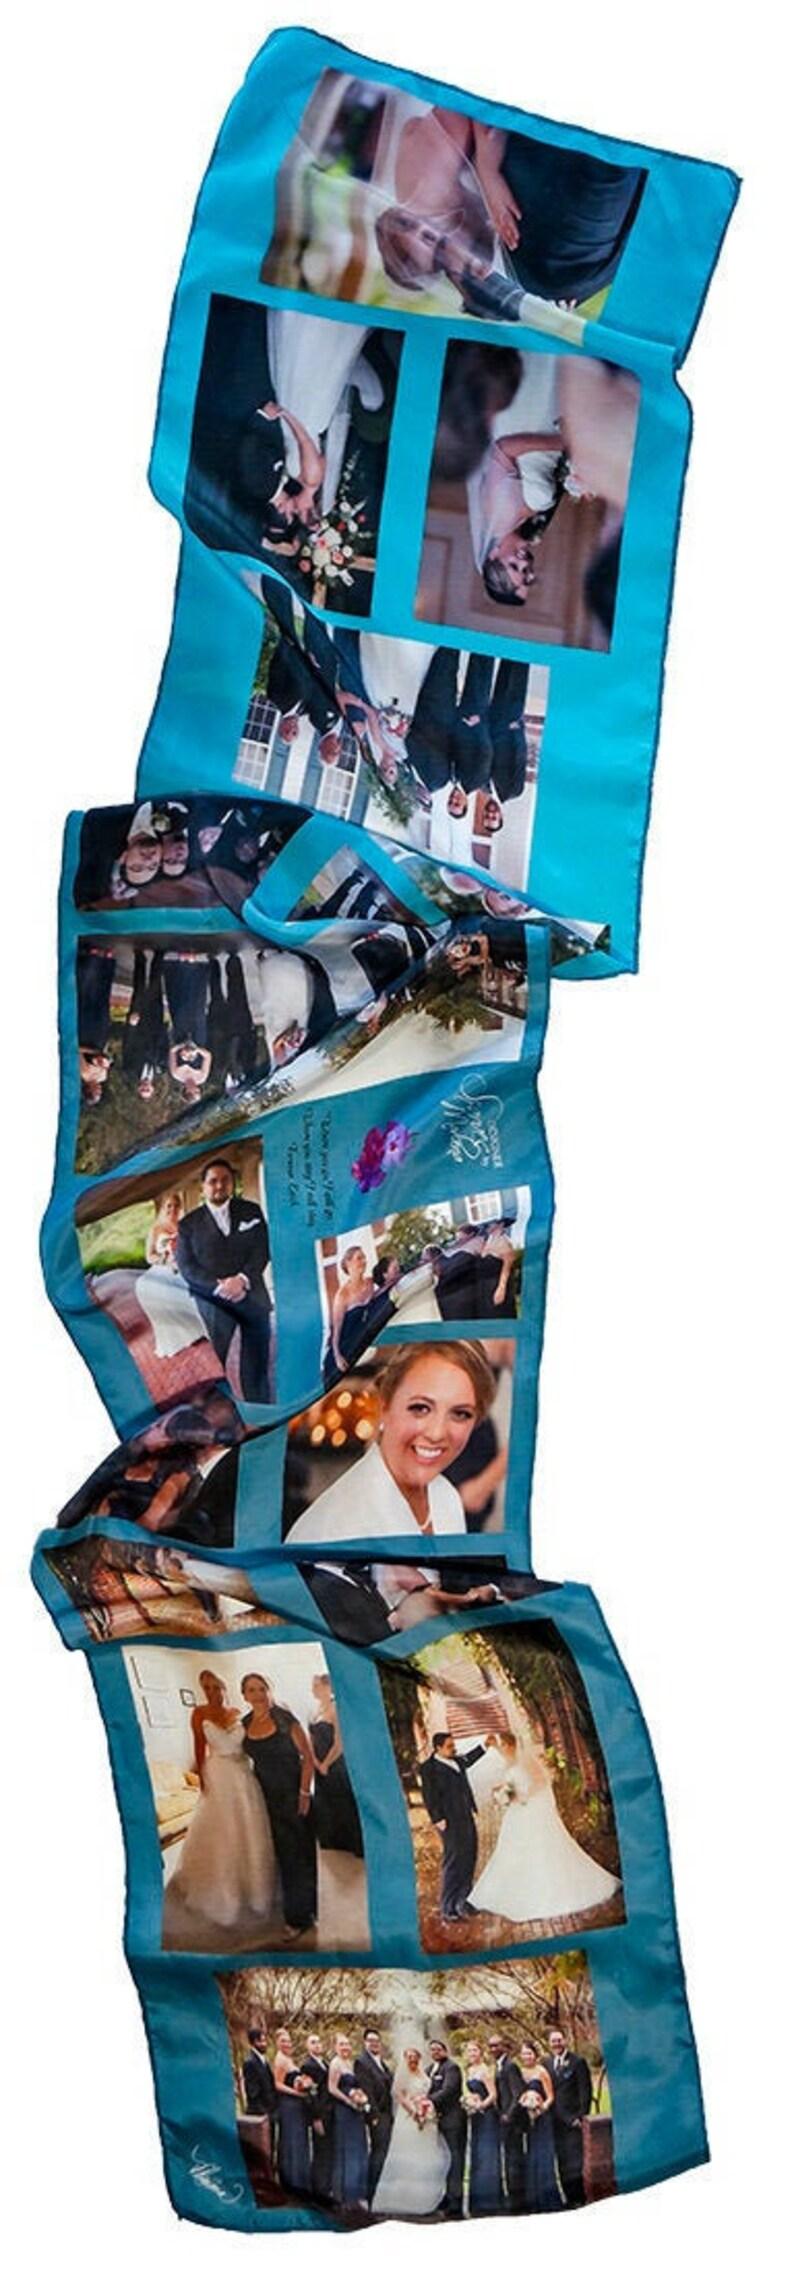 SAMPLE/Photo Print on Fabric/Scarf/Wedding Scarf/Wedding Photo image 0